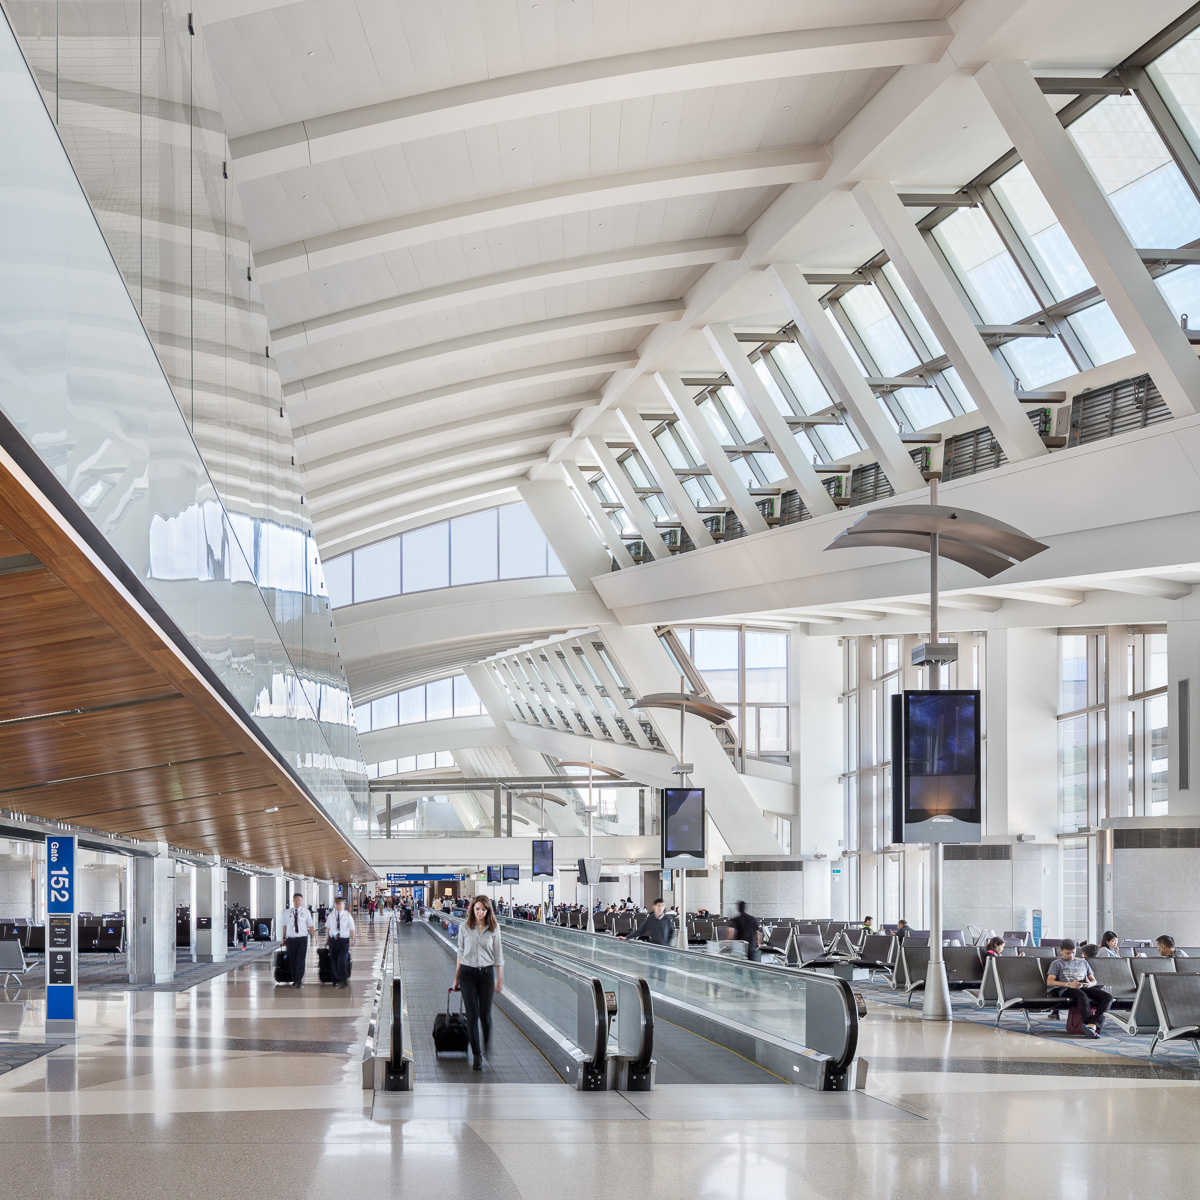 LAX-Architecture-Mike-Kelley-TBIT-1.jpg